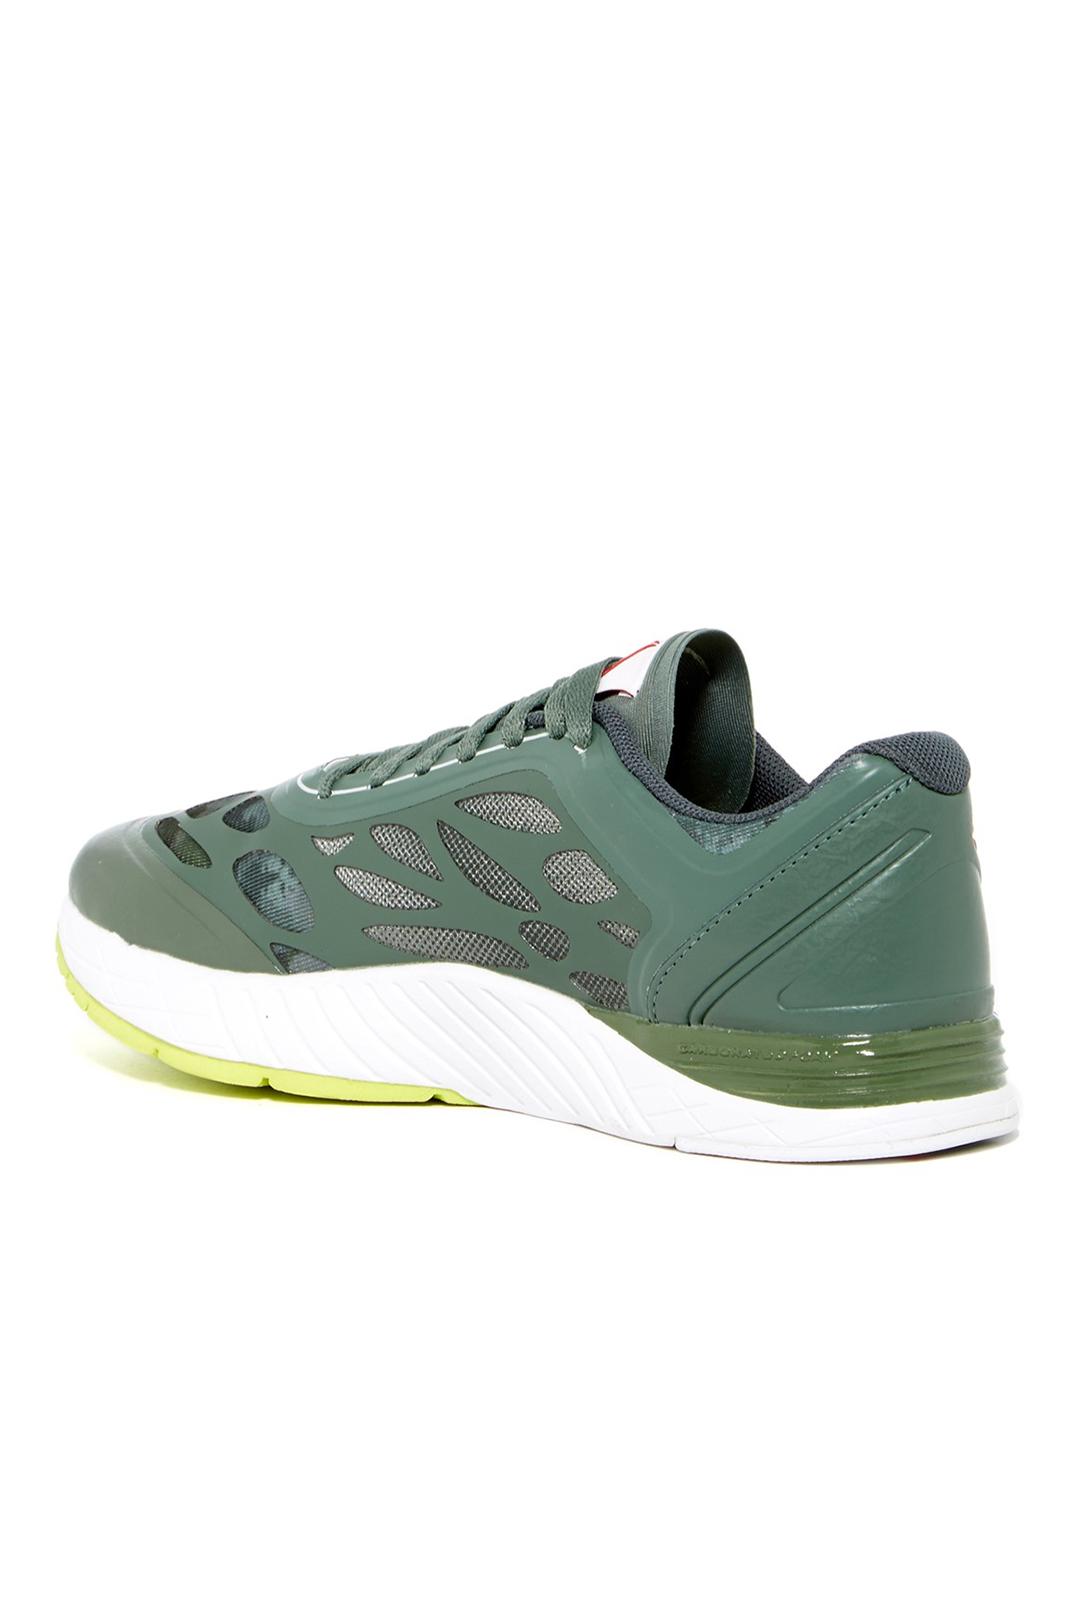 Baskets / Sneakers  Reebok V65777 CARDIO ULTRA VERT